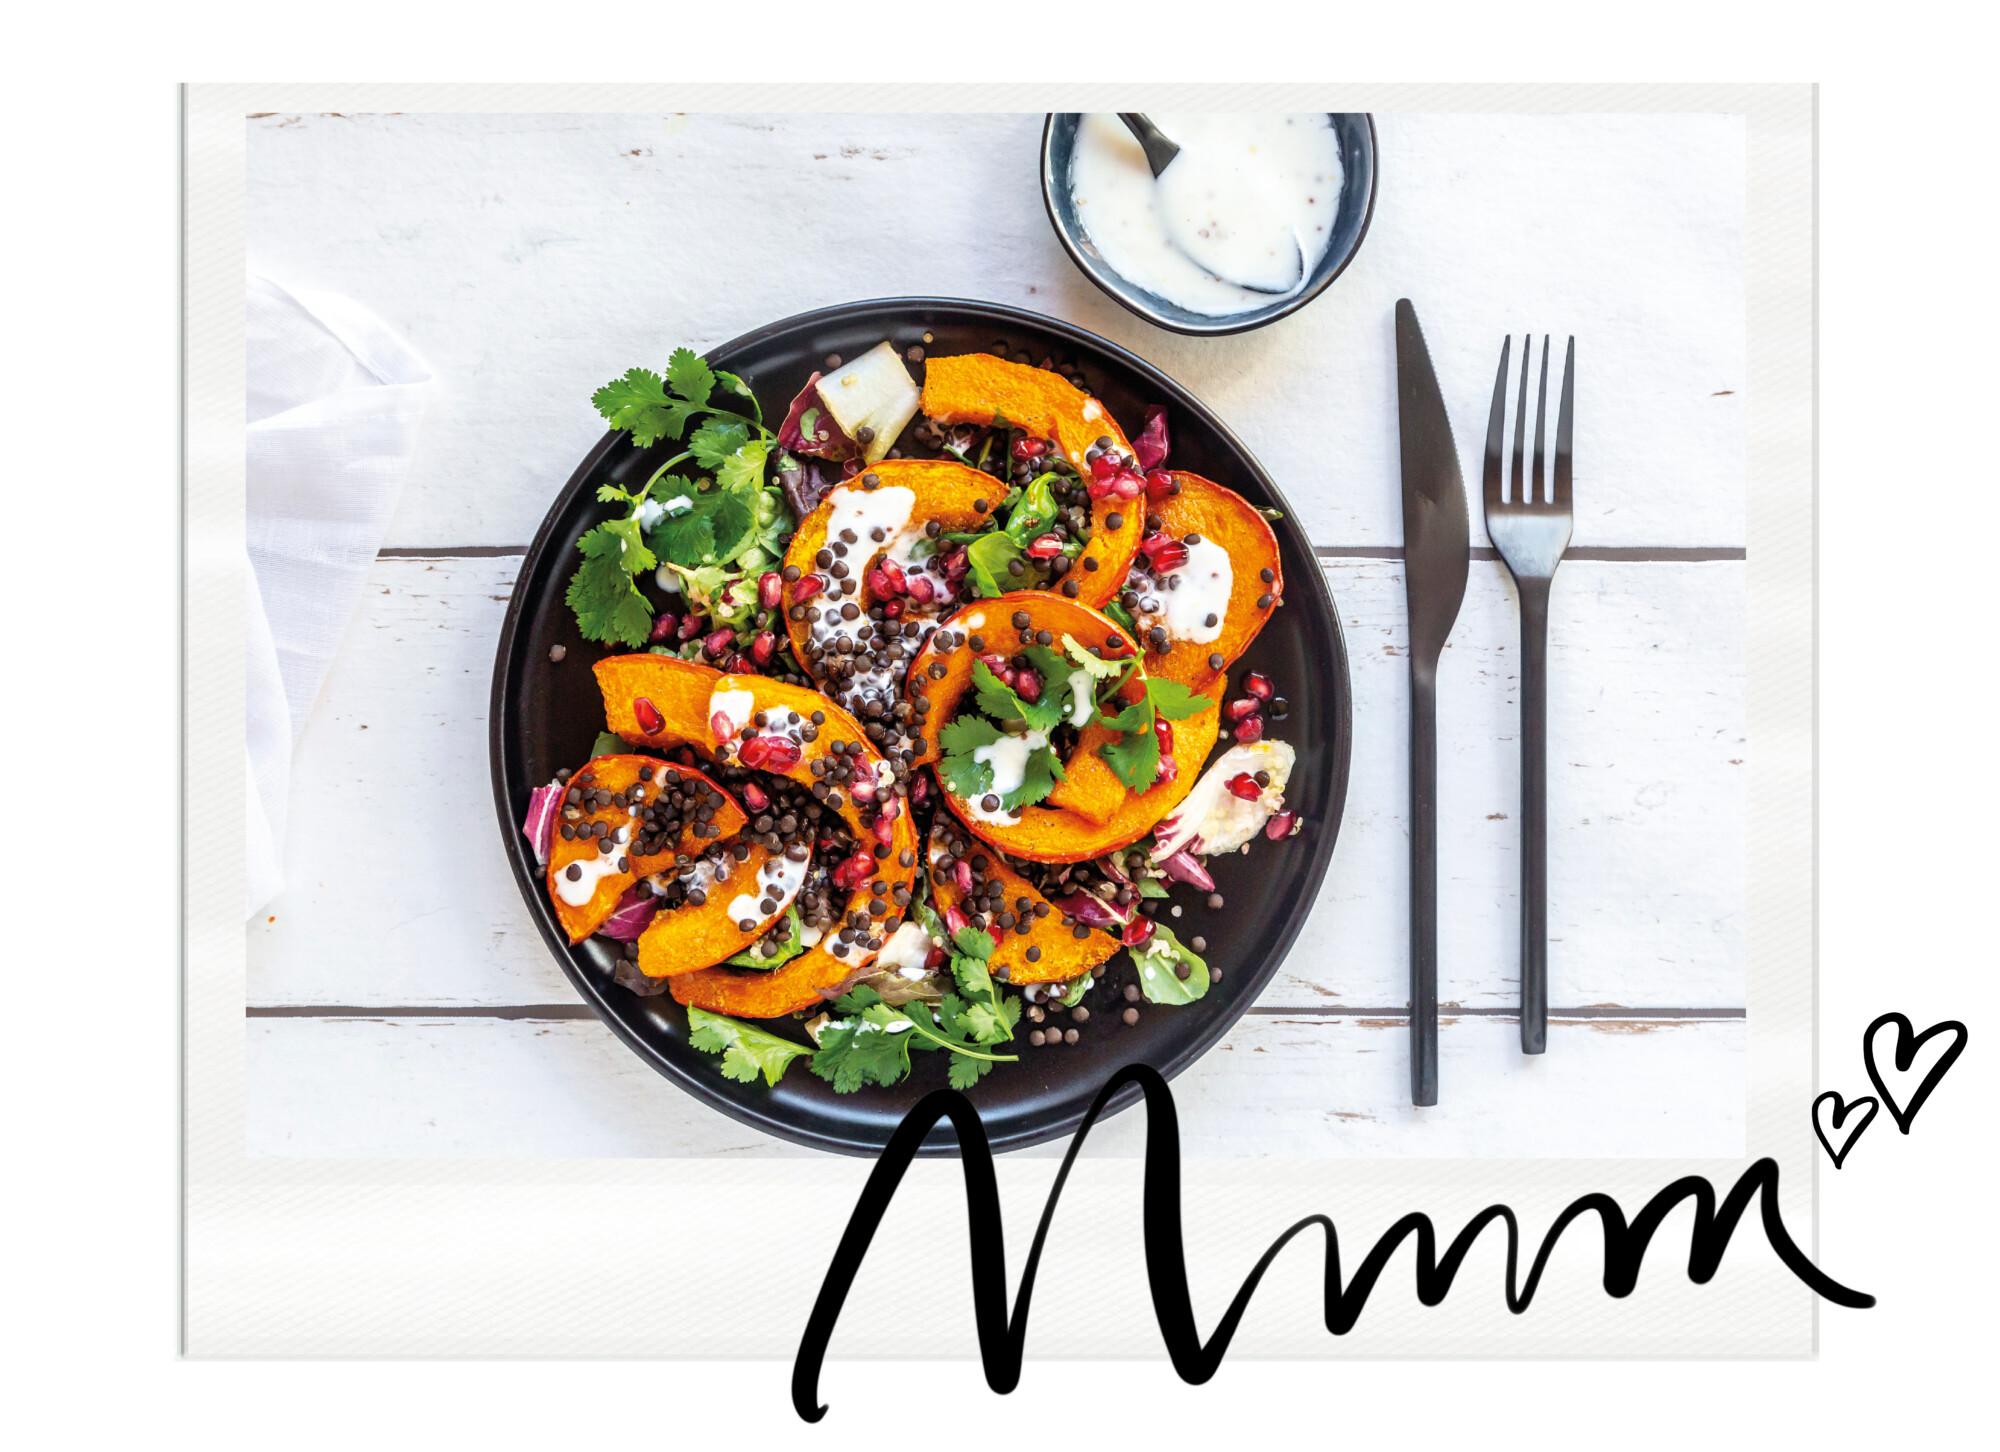 Salade met pompoen, feta, granaatappel pitjes en verse kruiden